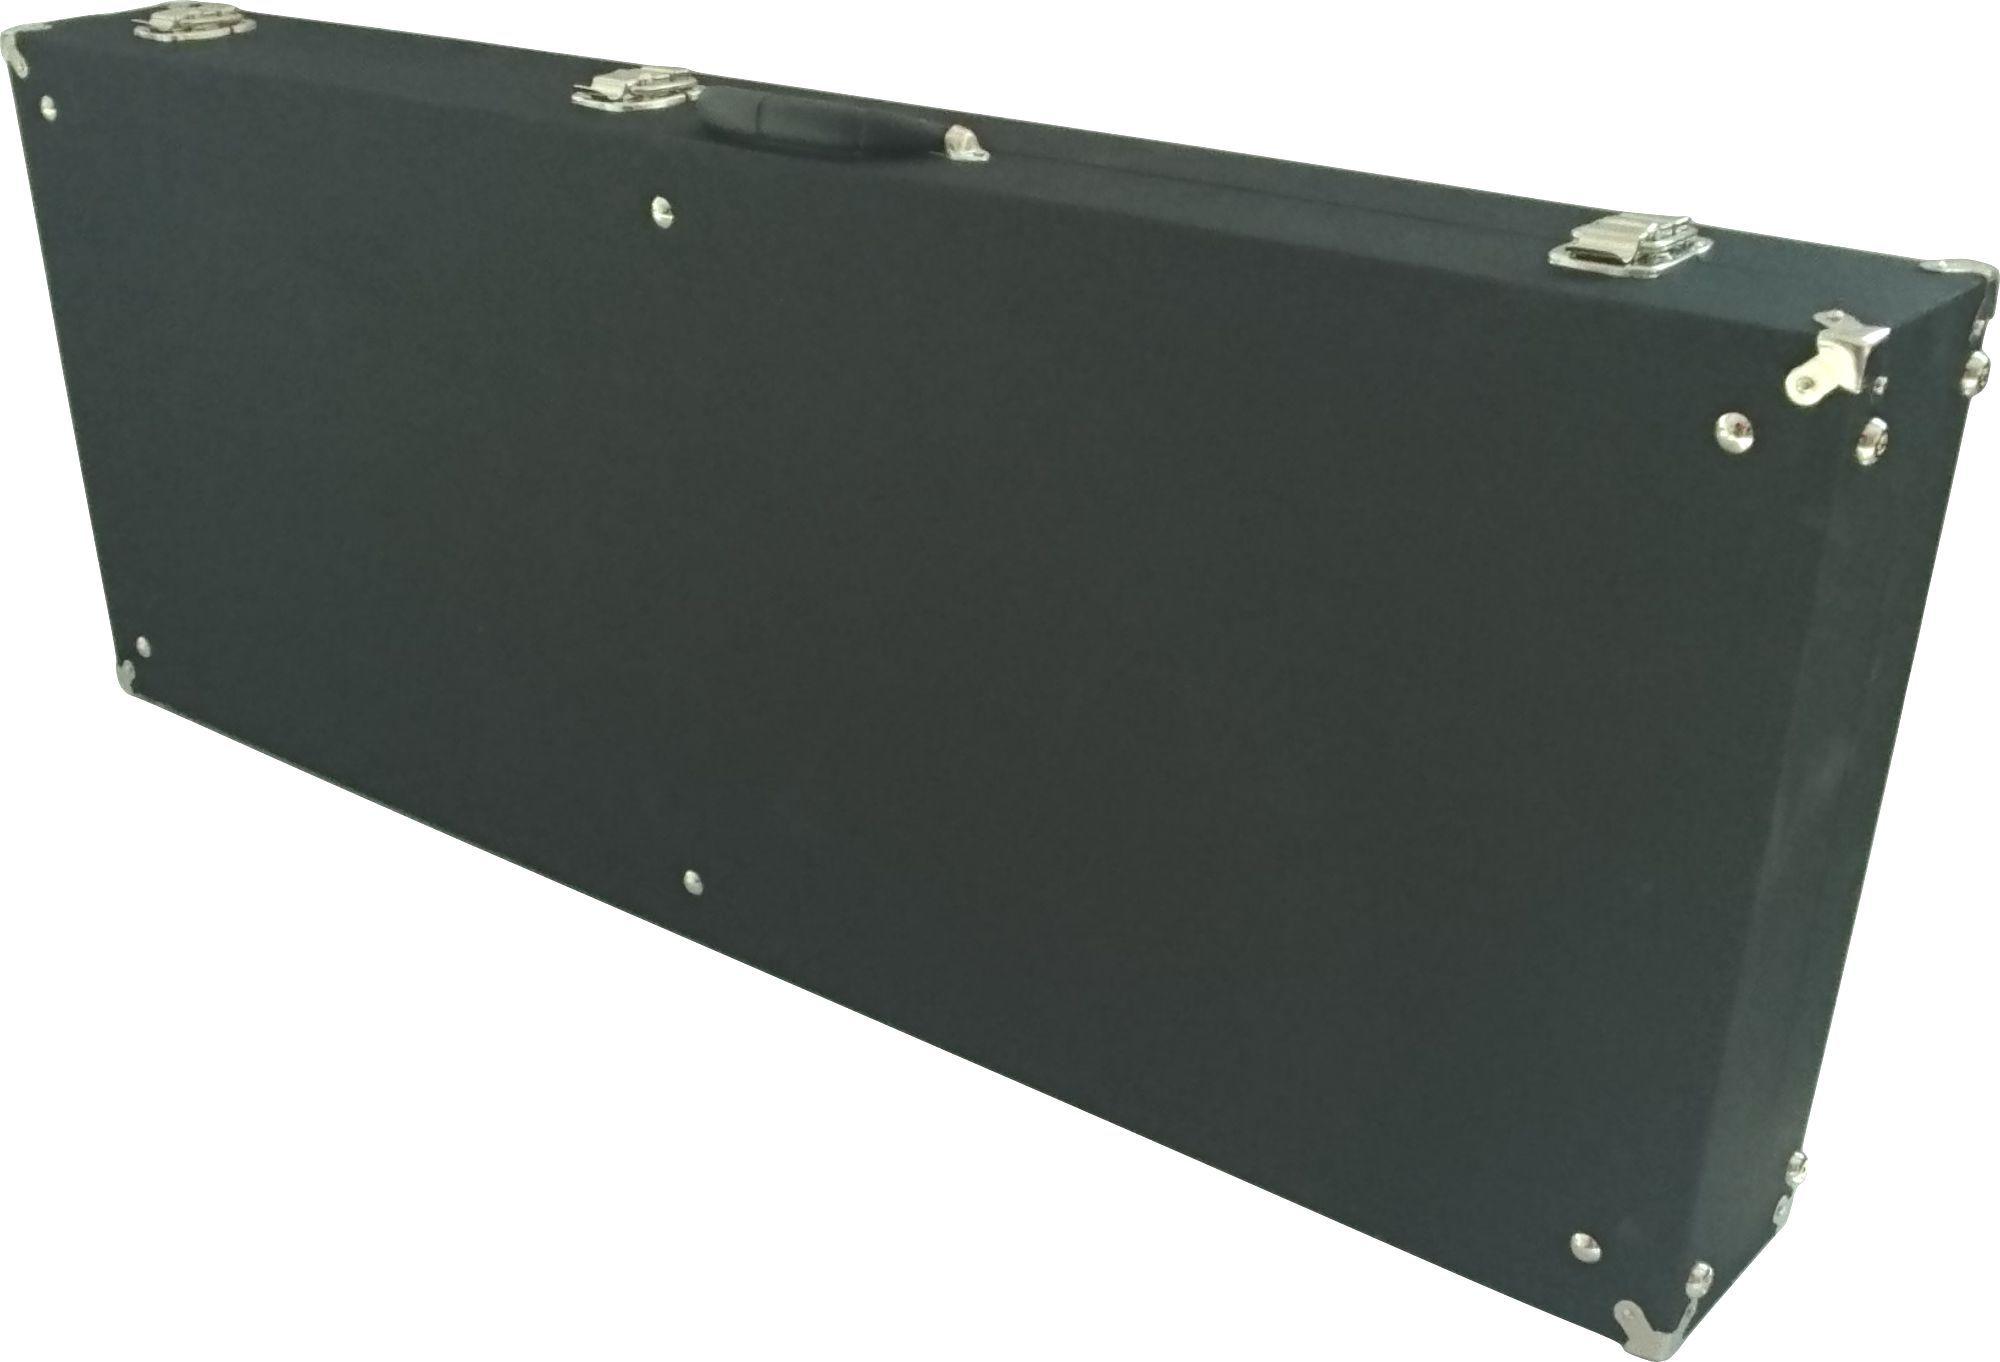 Case Guitarra Les Paul Strato Fender Standard Fama